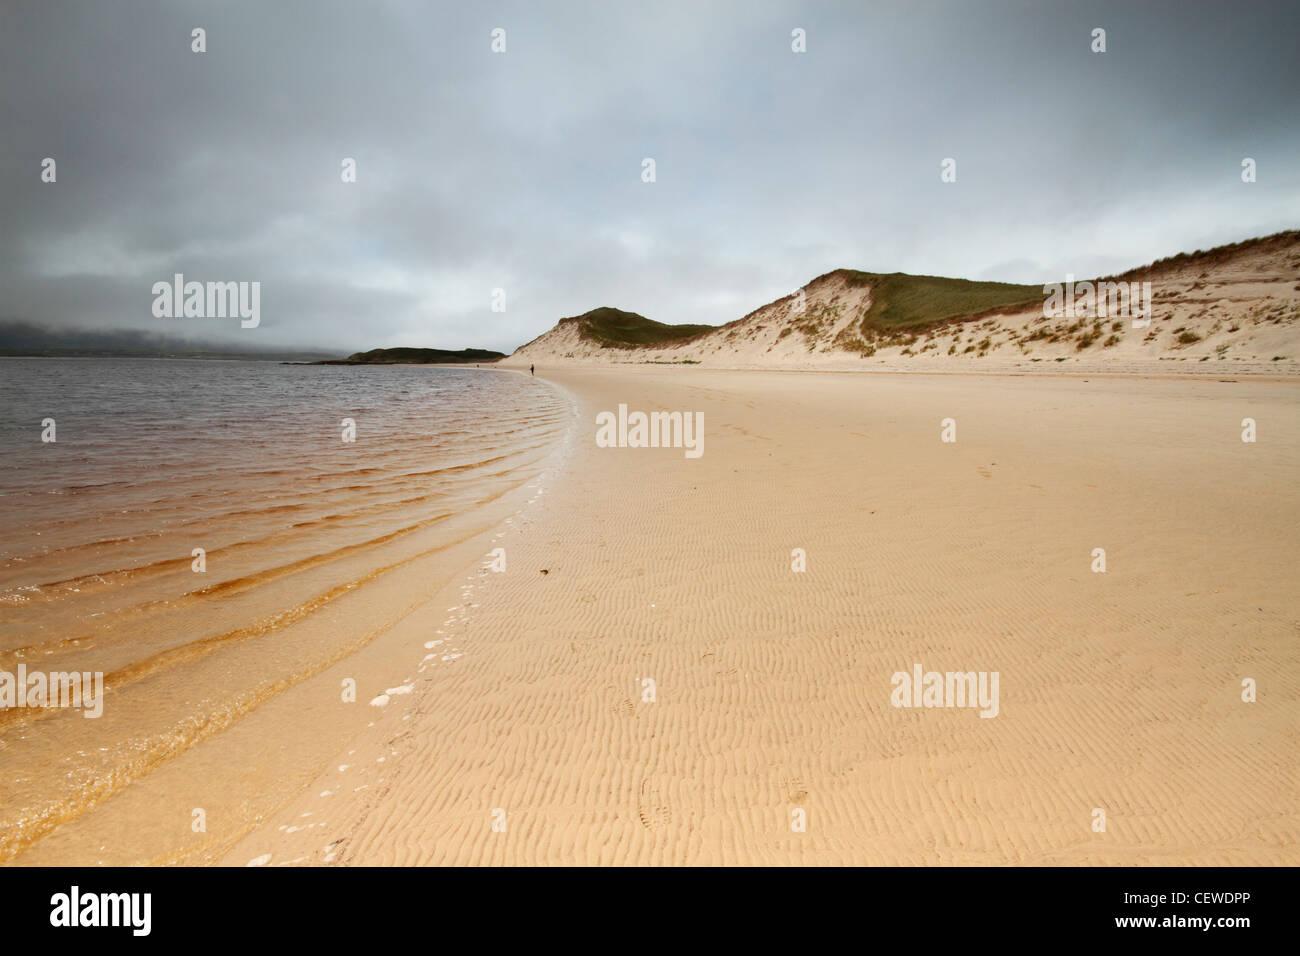 Ballinreavy Strand on Loughros More Bay, Ireland - Stock Image